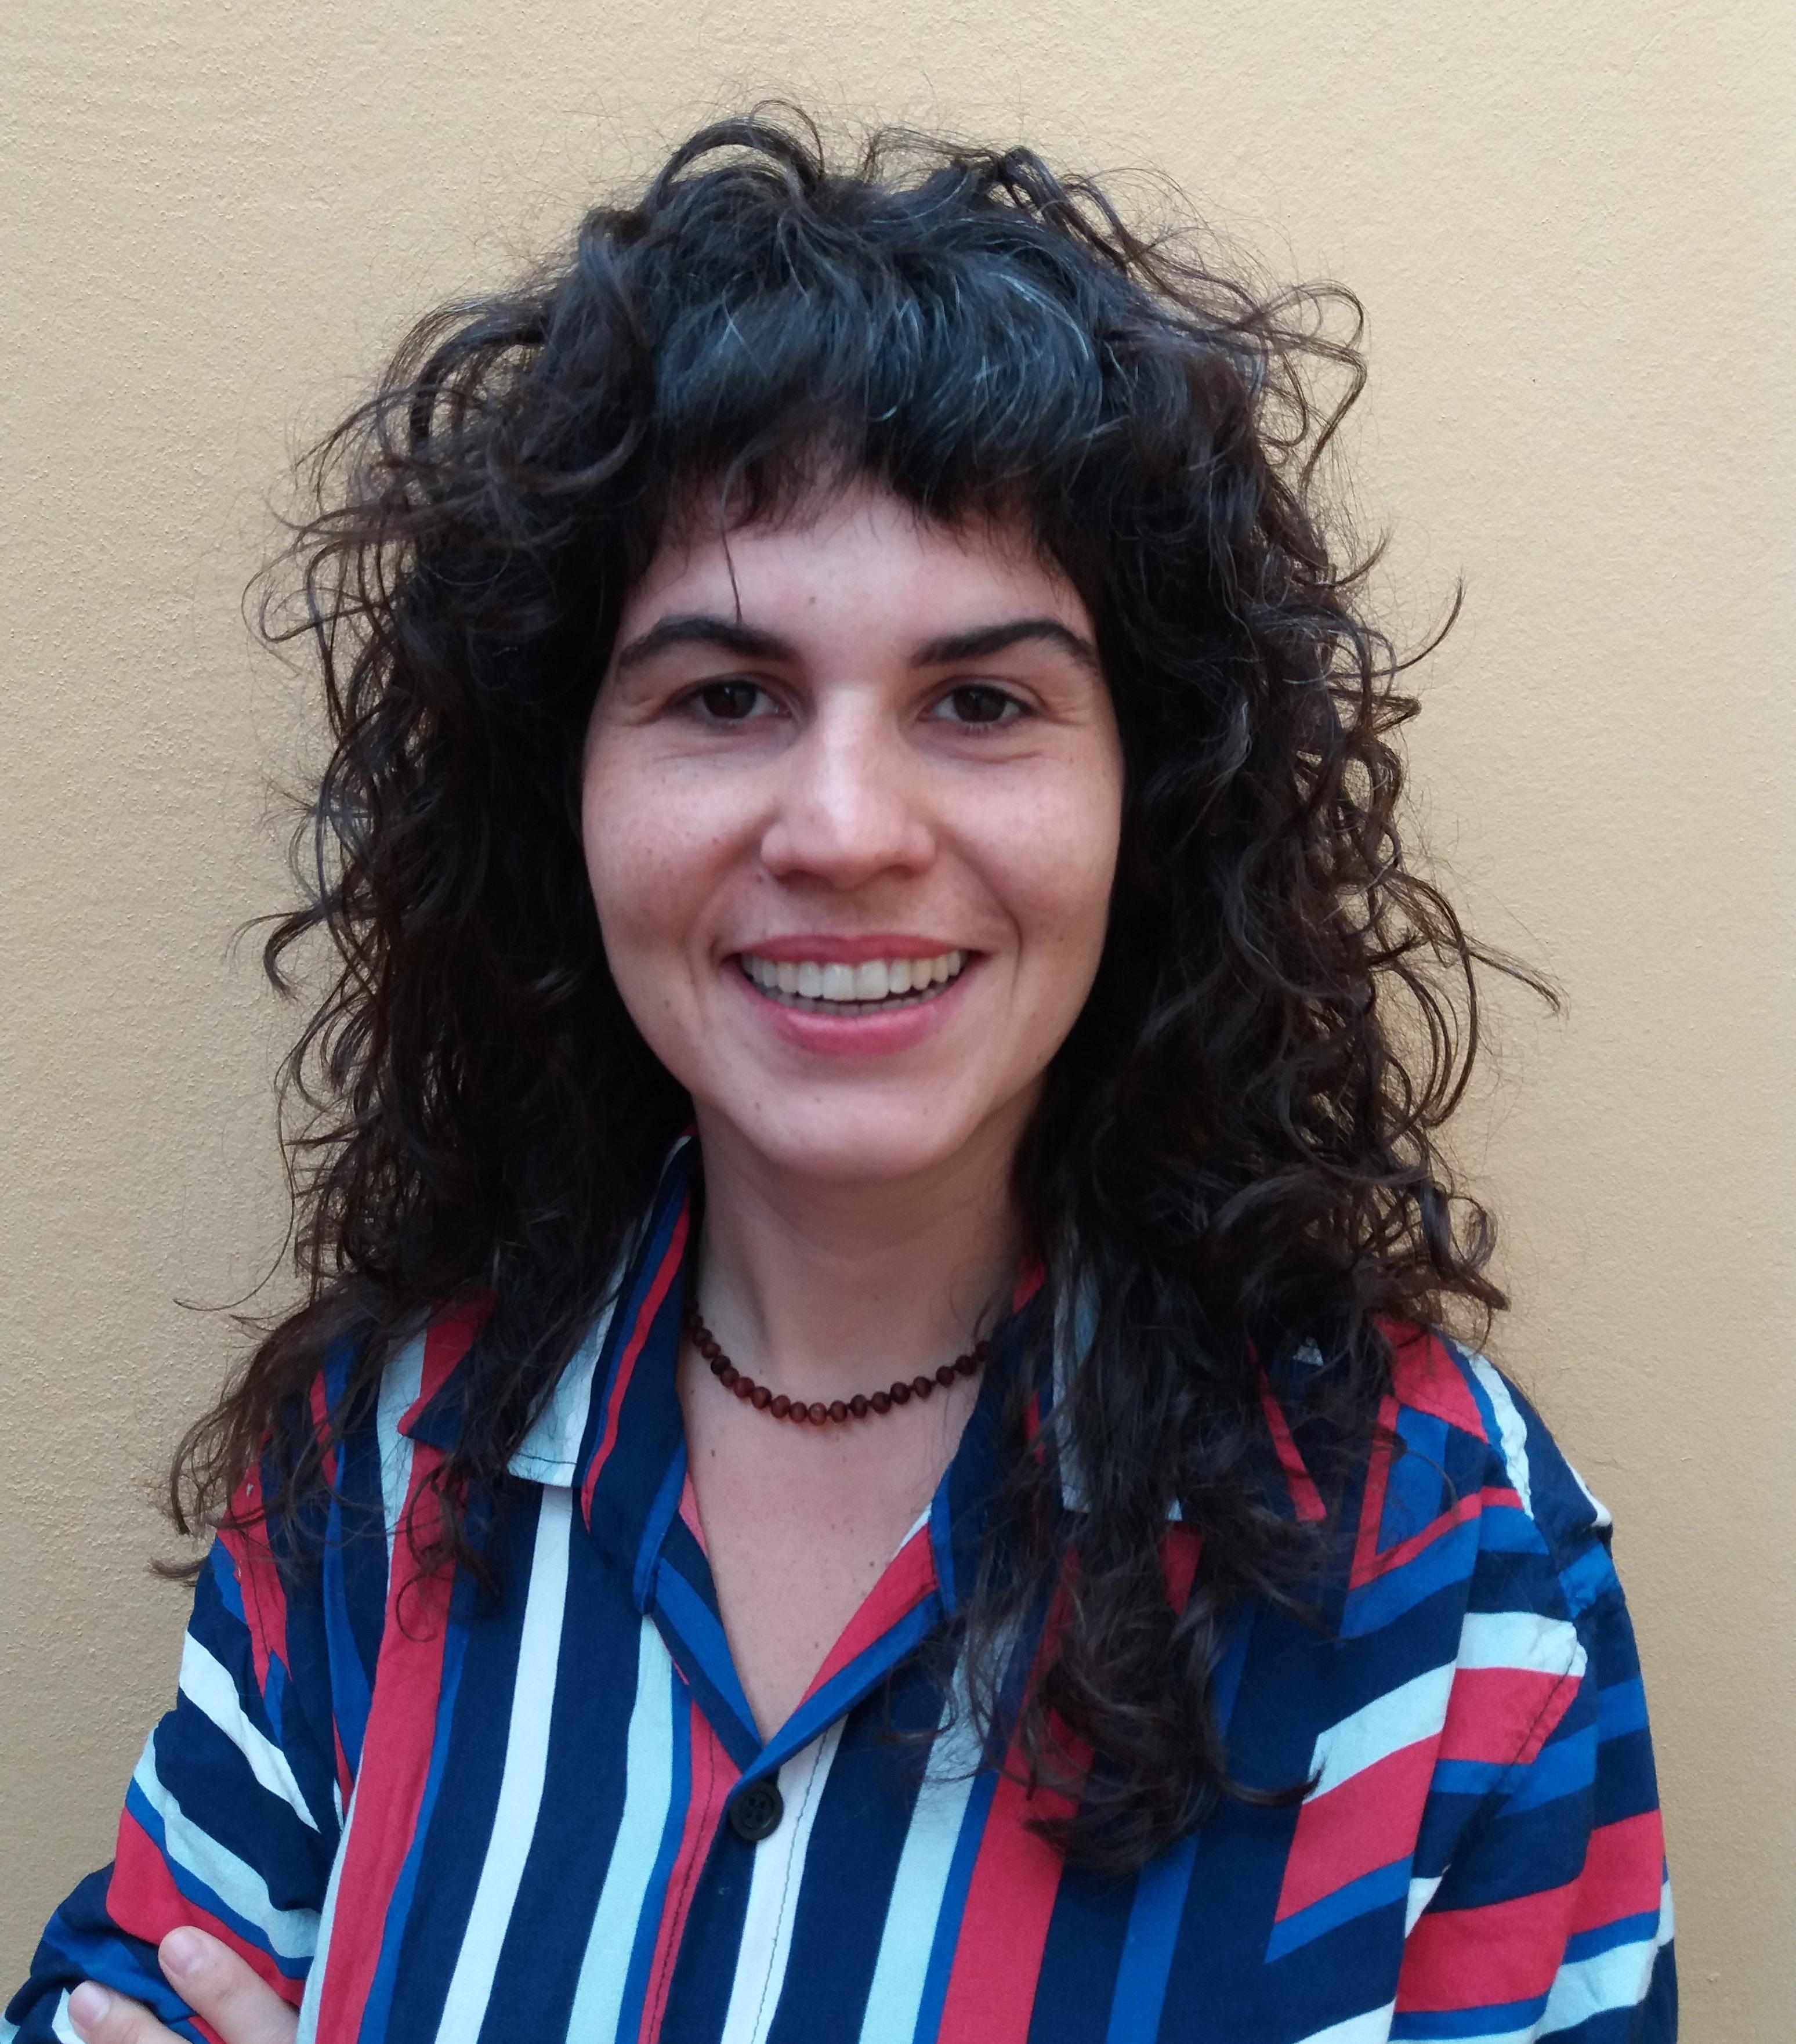 Julia Produtora